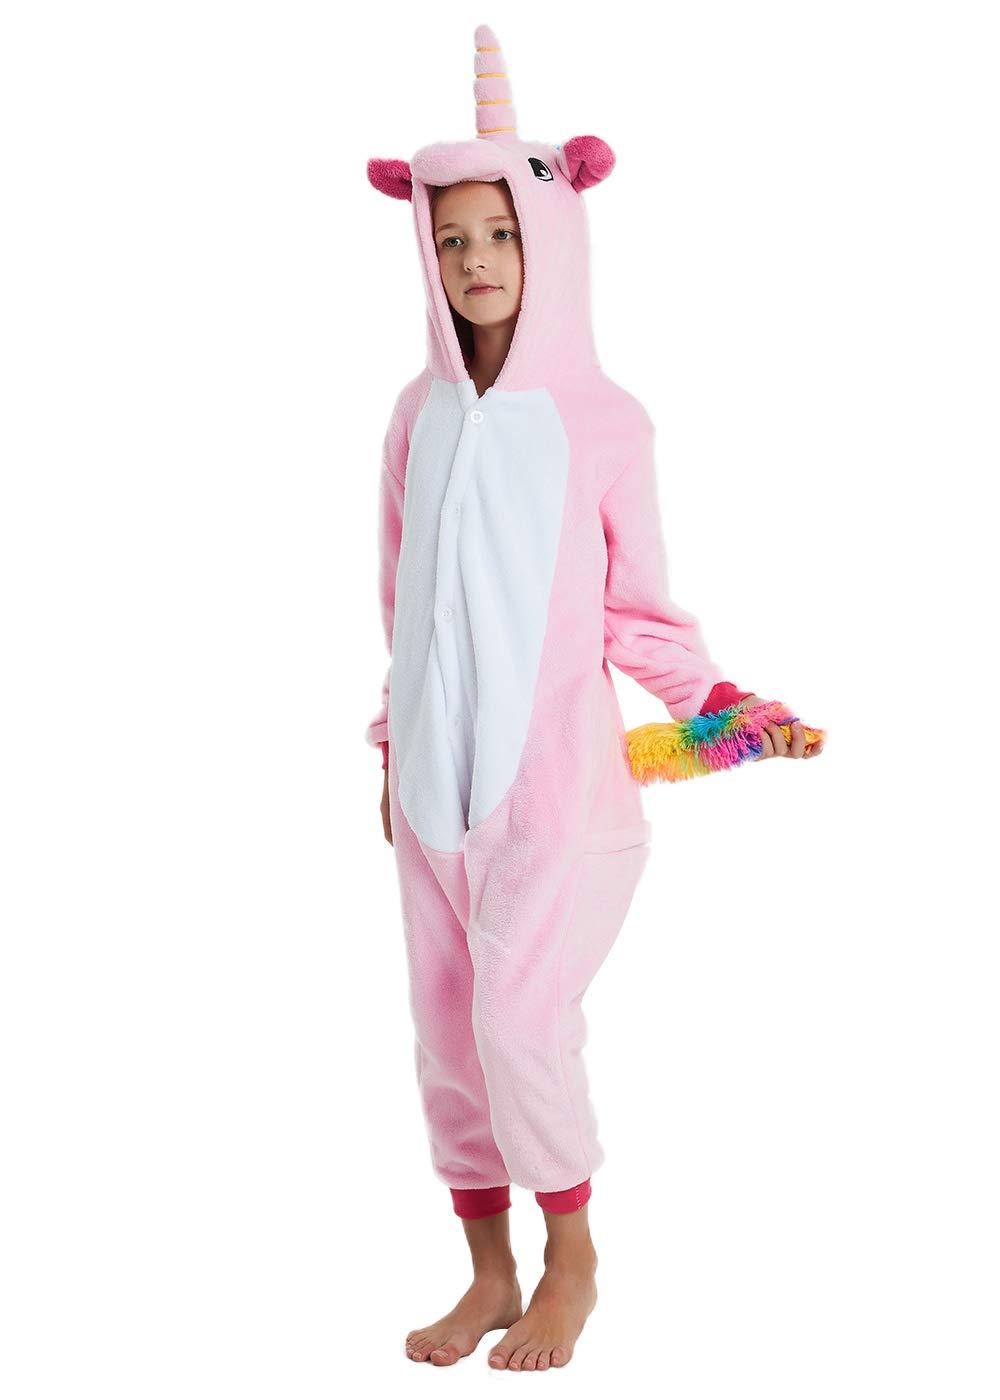 ABENCA Unisex Kids Unicorn Onesie Pajamas Animal Christmas Halloween Cosplay Costume Sleepwear